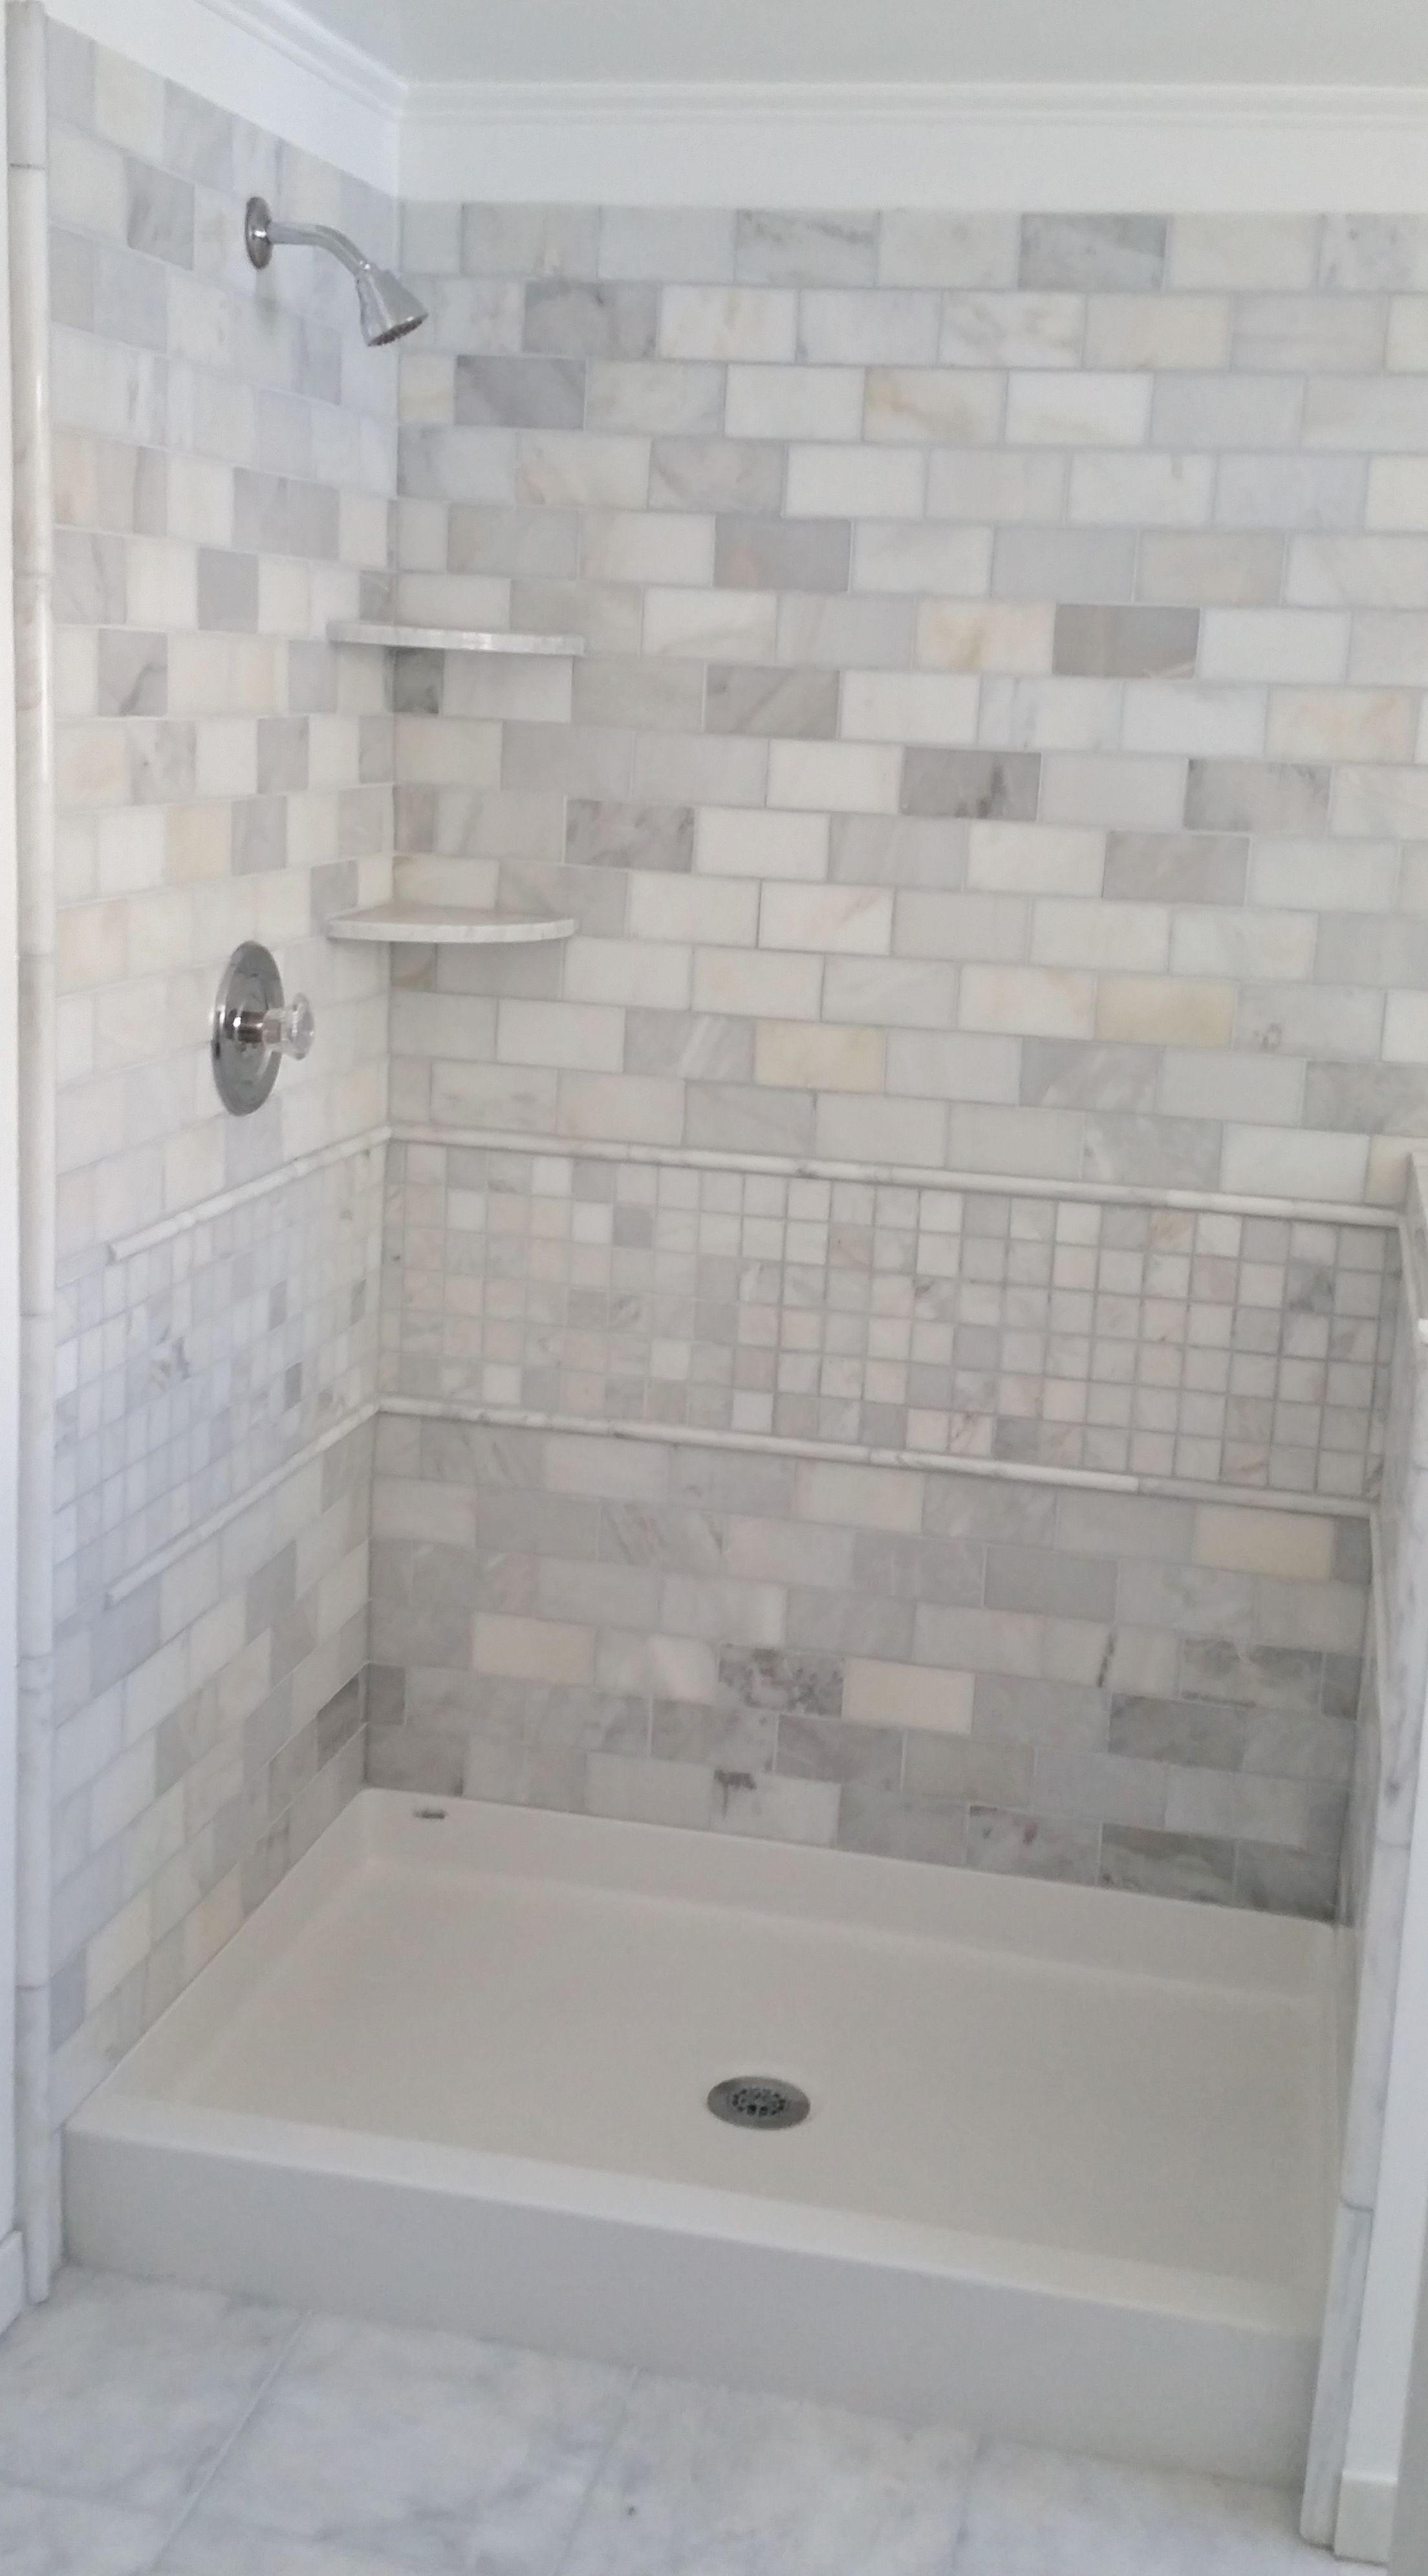 Shower Pans Bathroom Remodel Projects Bathroom Shower Pan Basement Bathroom